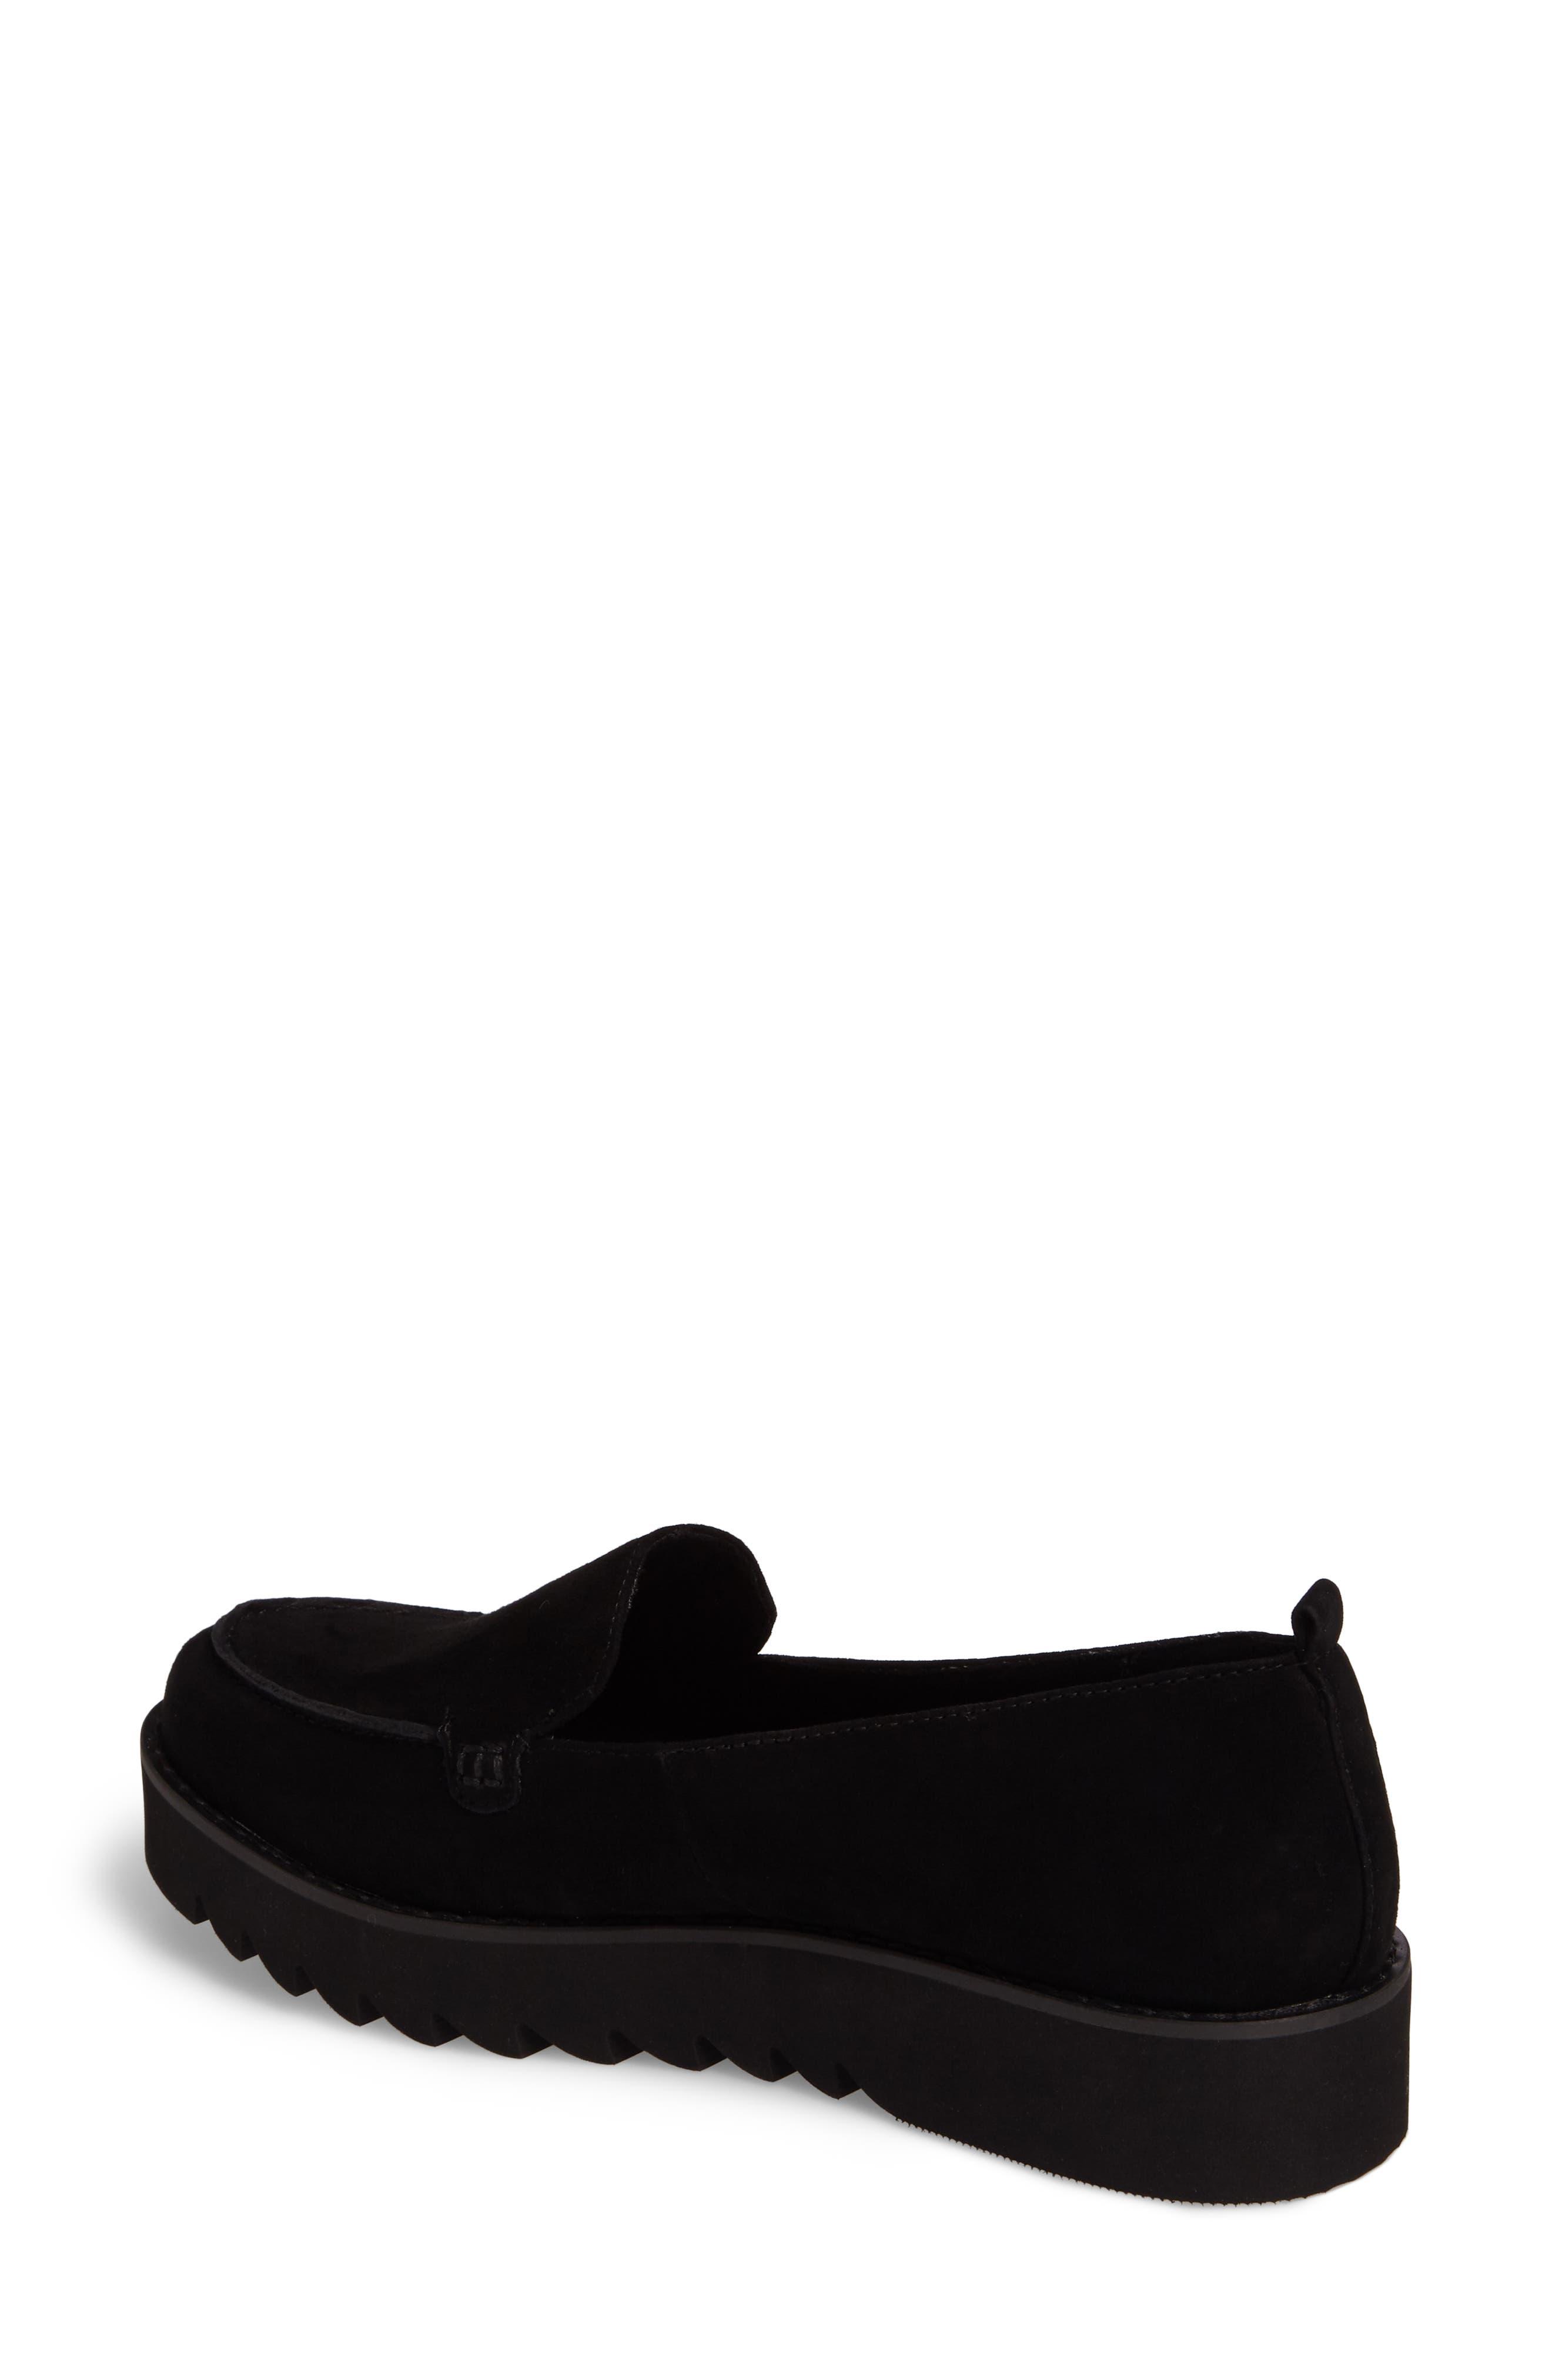 Kendall Loafer,                             Alternate thumbnail 2, color,                             Black Suede